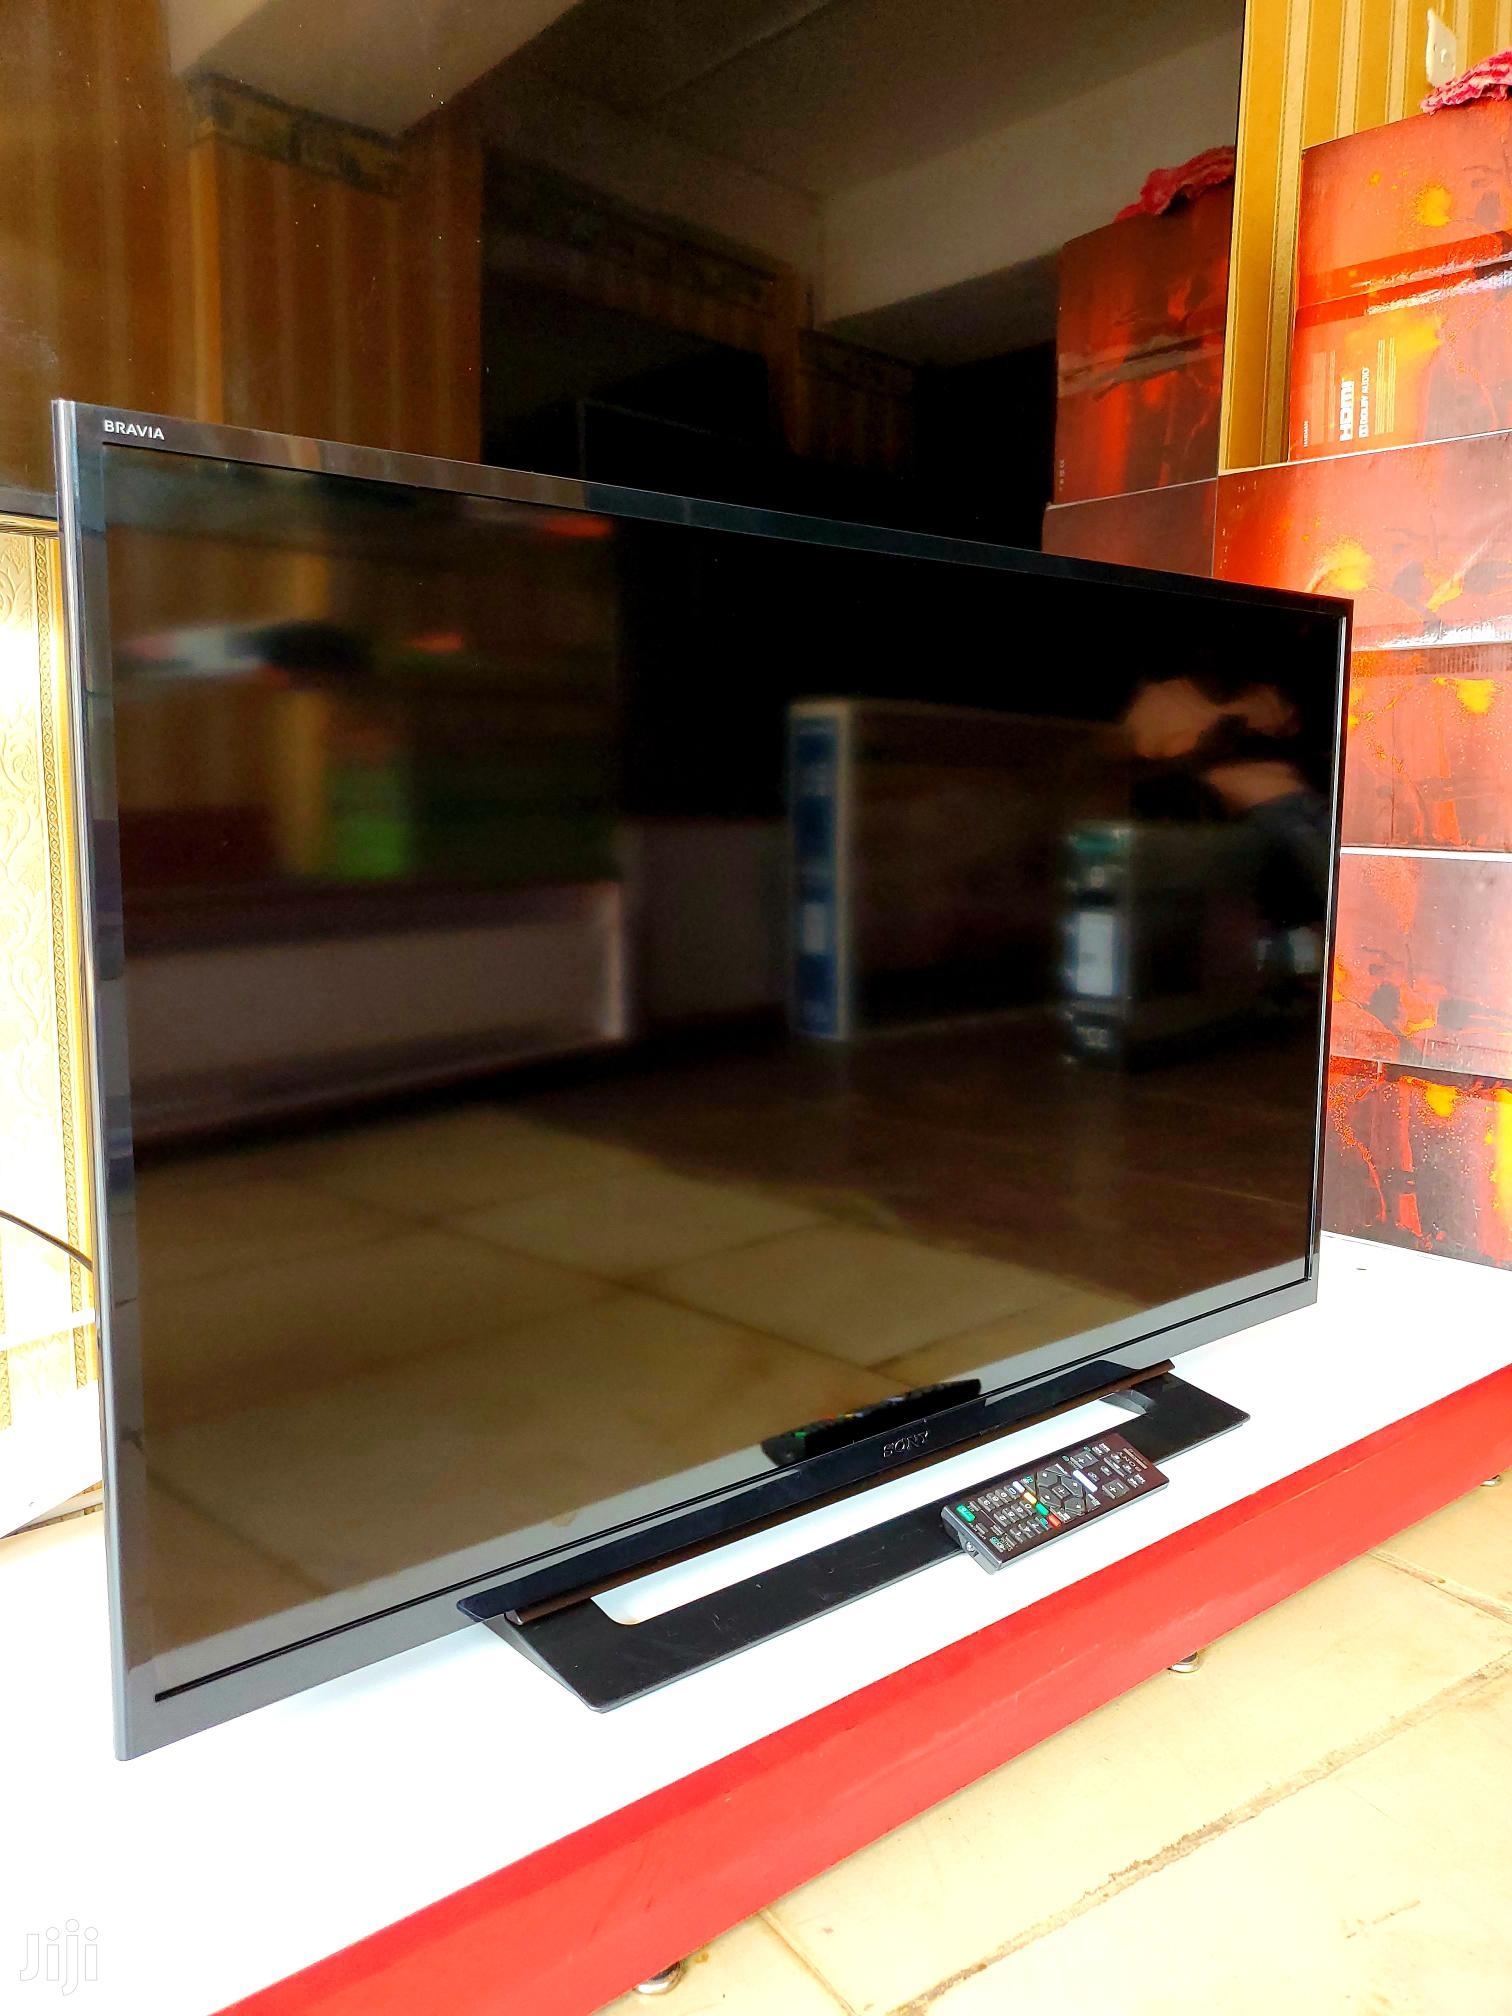 Genuine Sony Bravia 42inch Digital Satellite Led Tvs